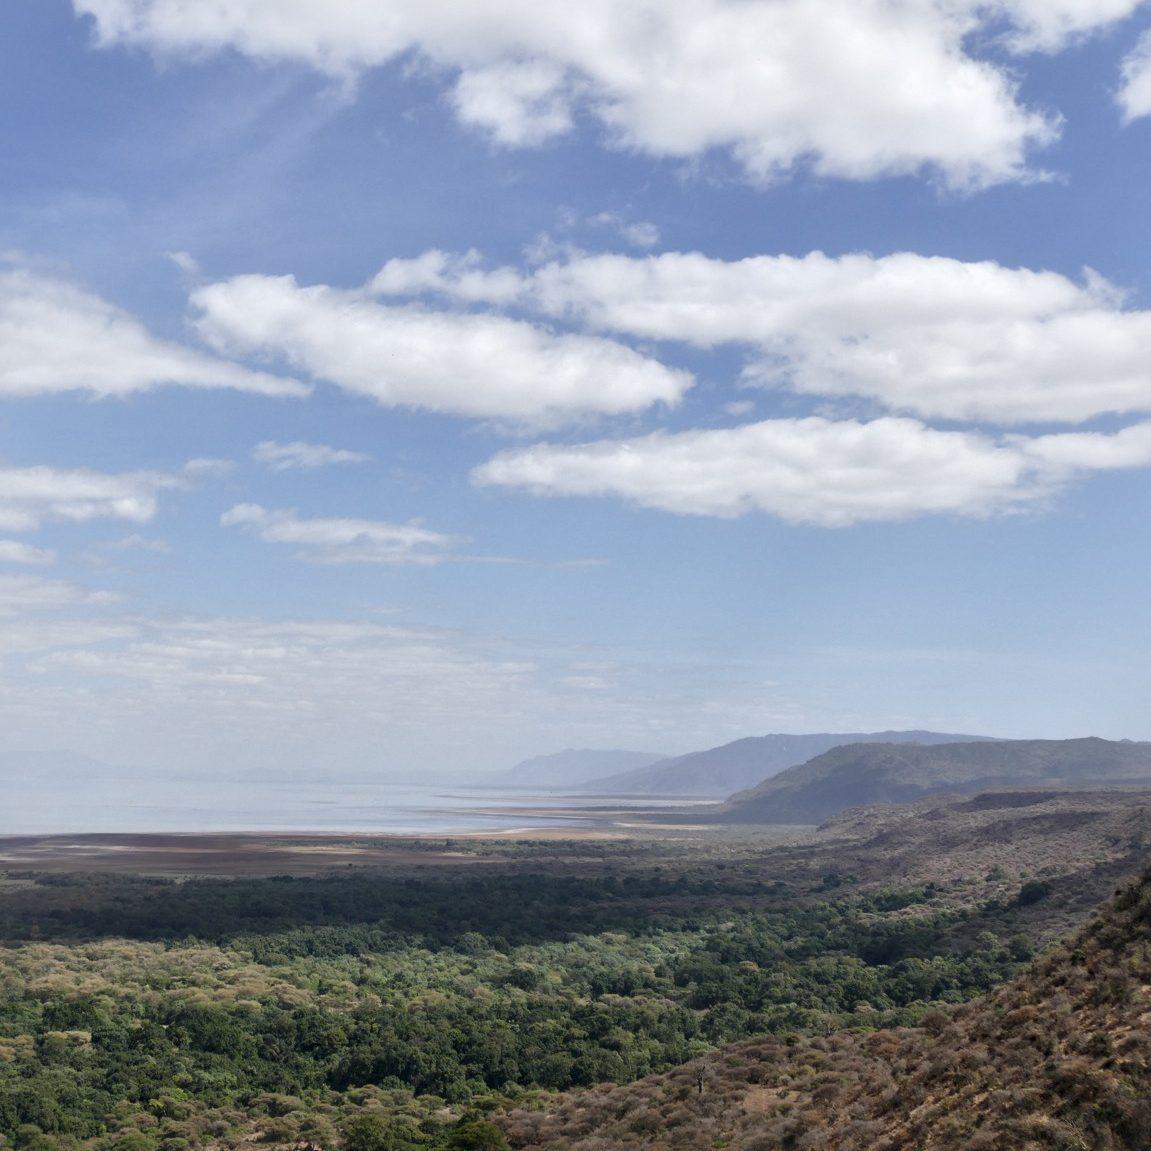 A view of Tanzania's Rift Valley en route to Arusha. A view of Tanzania's Rift Valley en route to Arusha. Noah Strycker